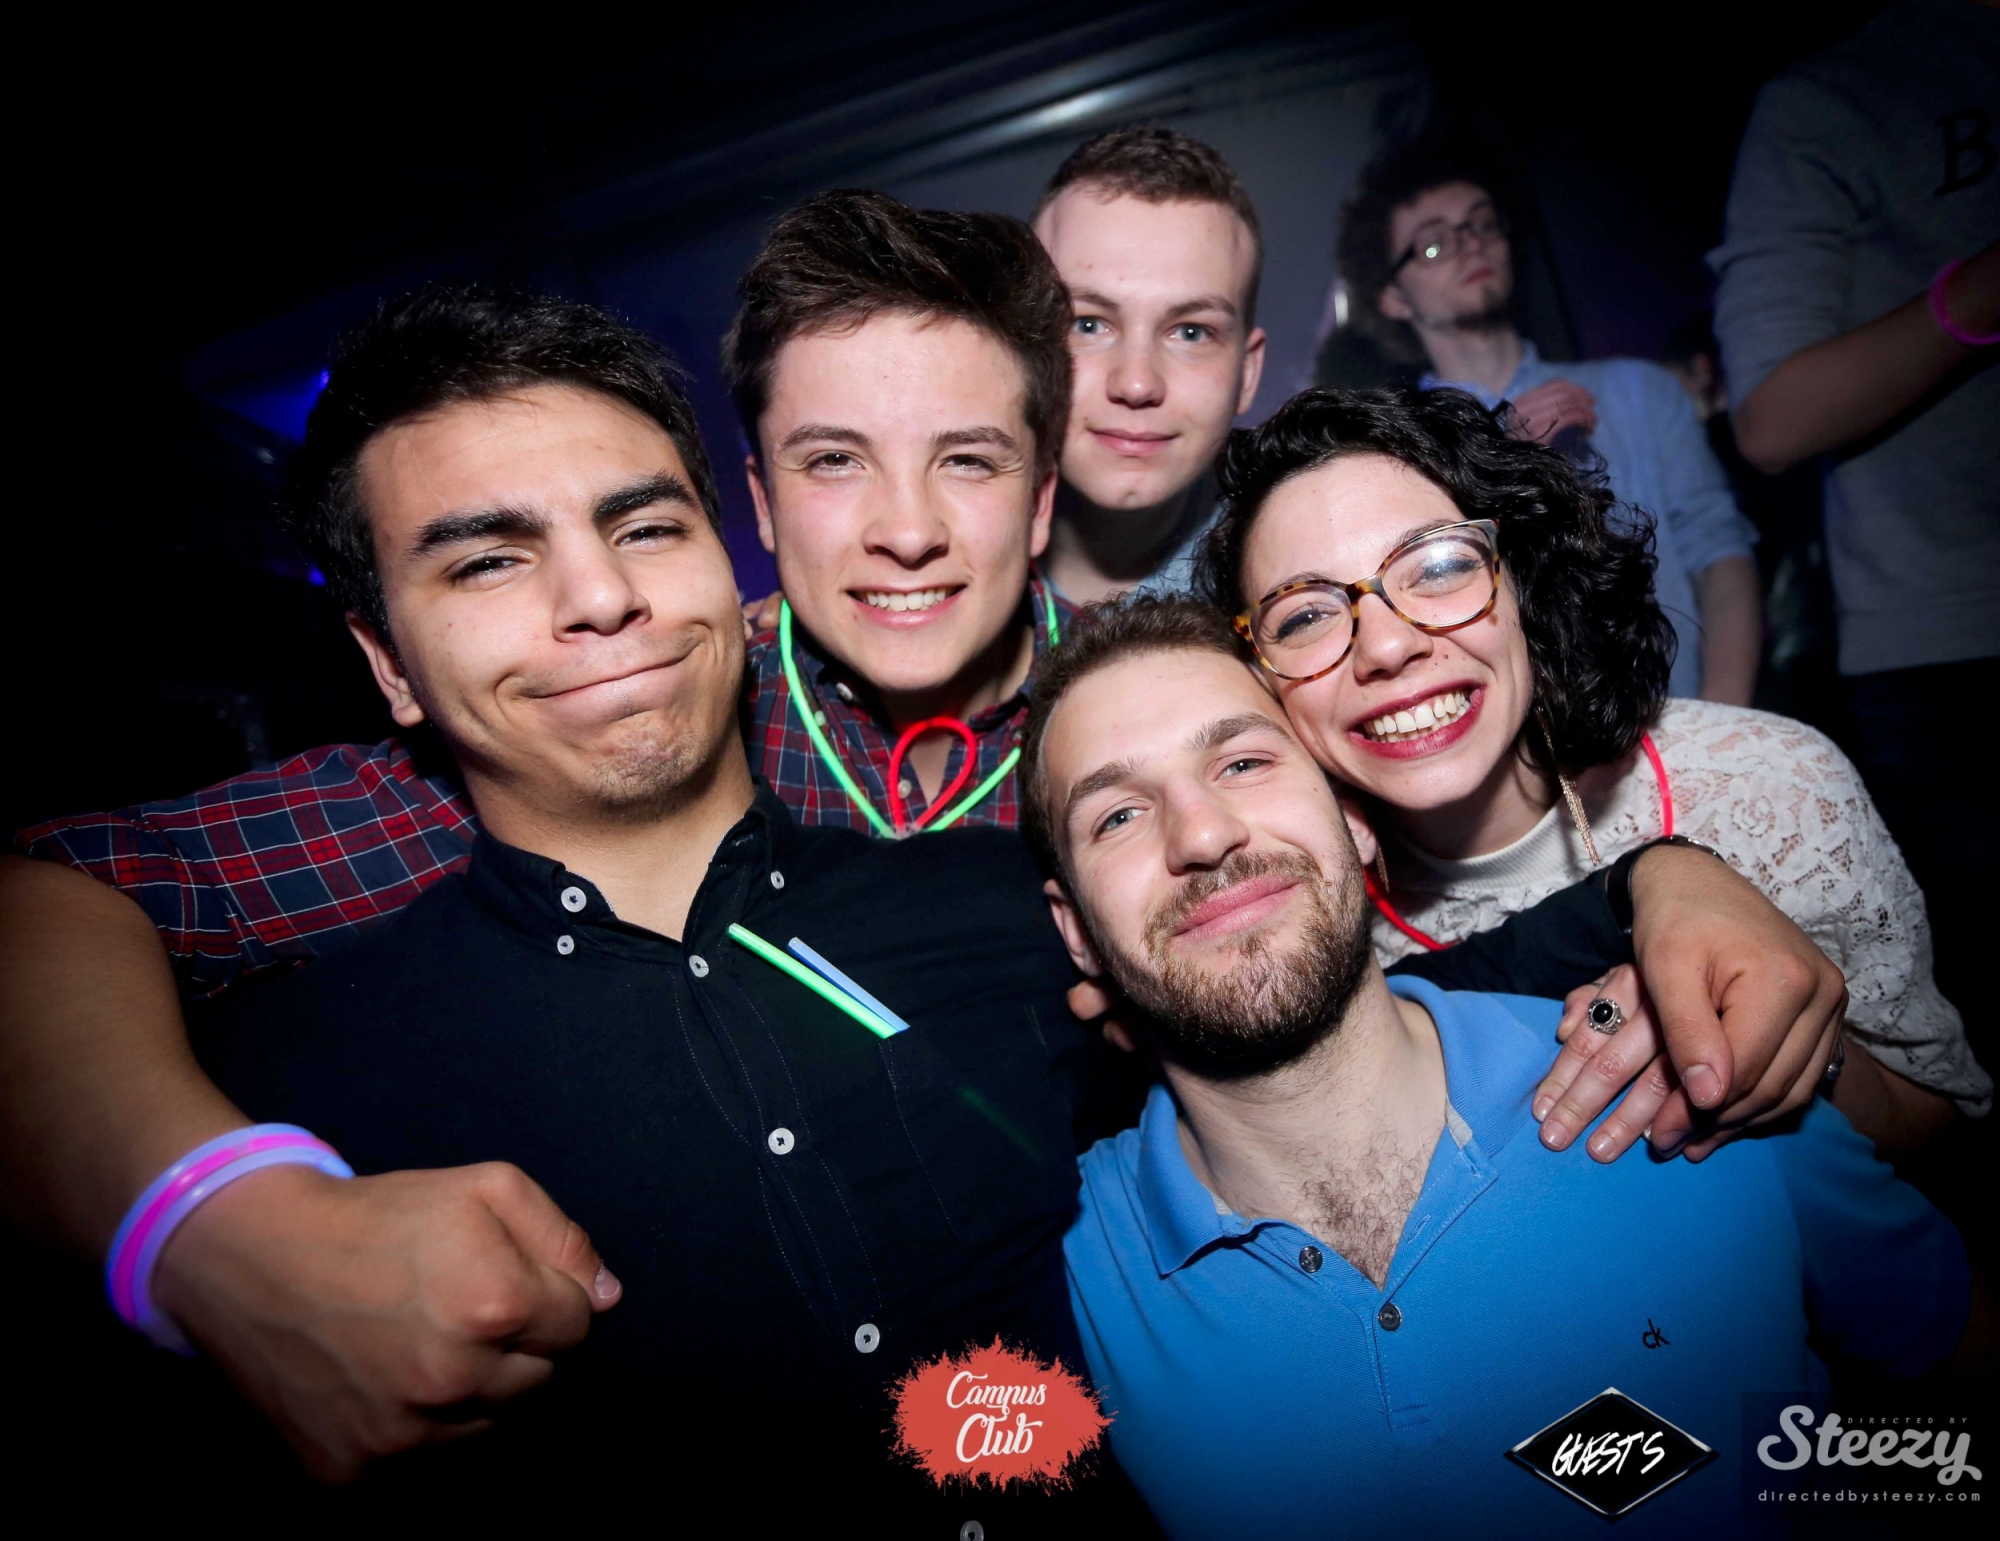 Inter IUT by campus Club - Jeudi 23 Mars 2017 - 022